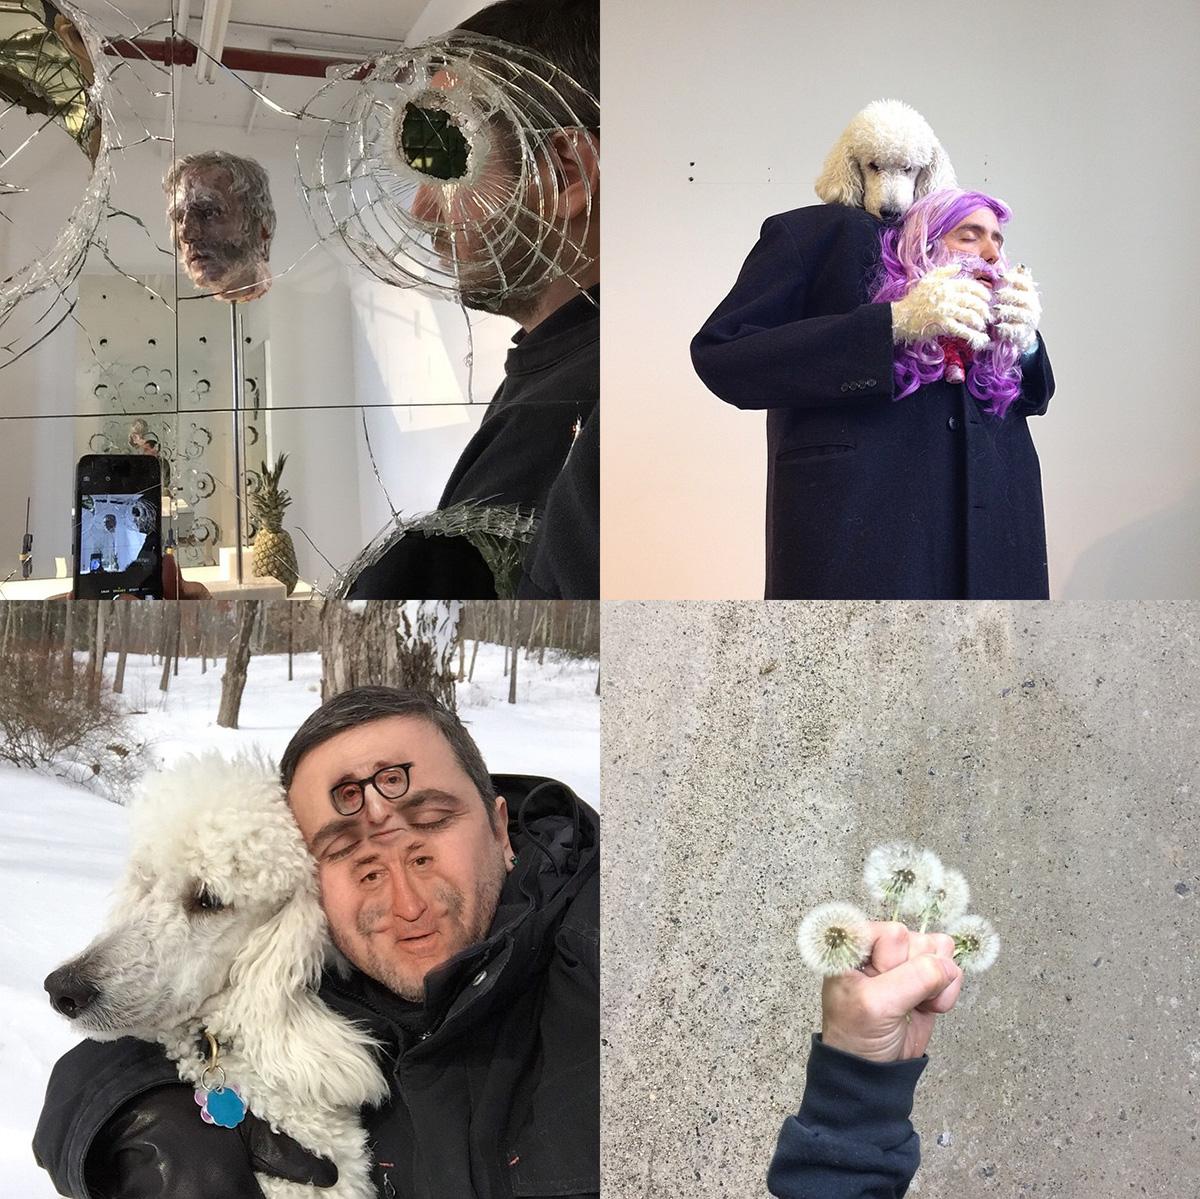 Altmejd's Instagram